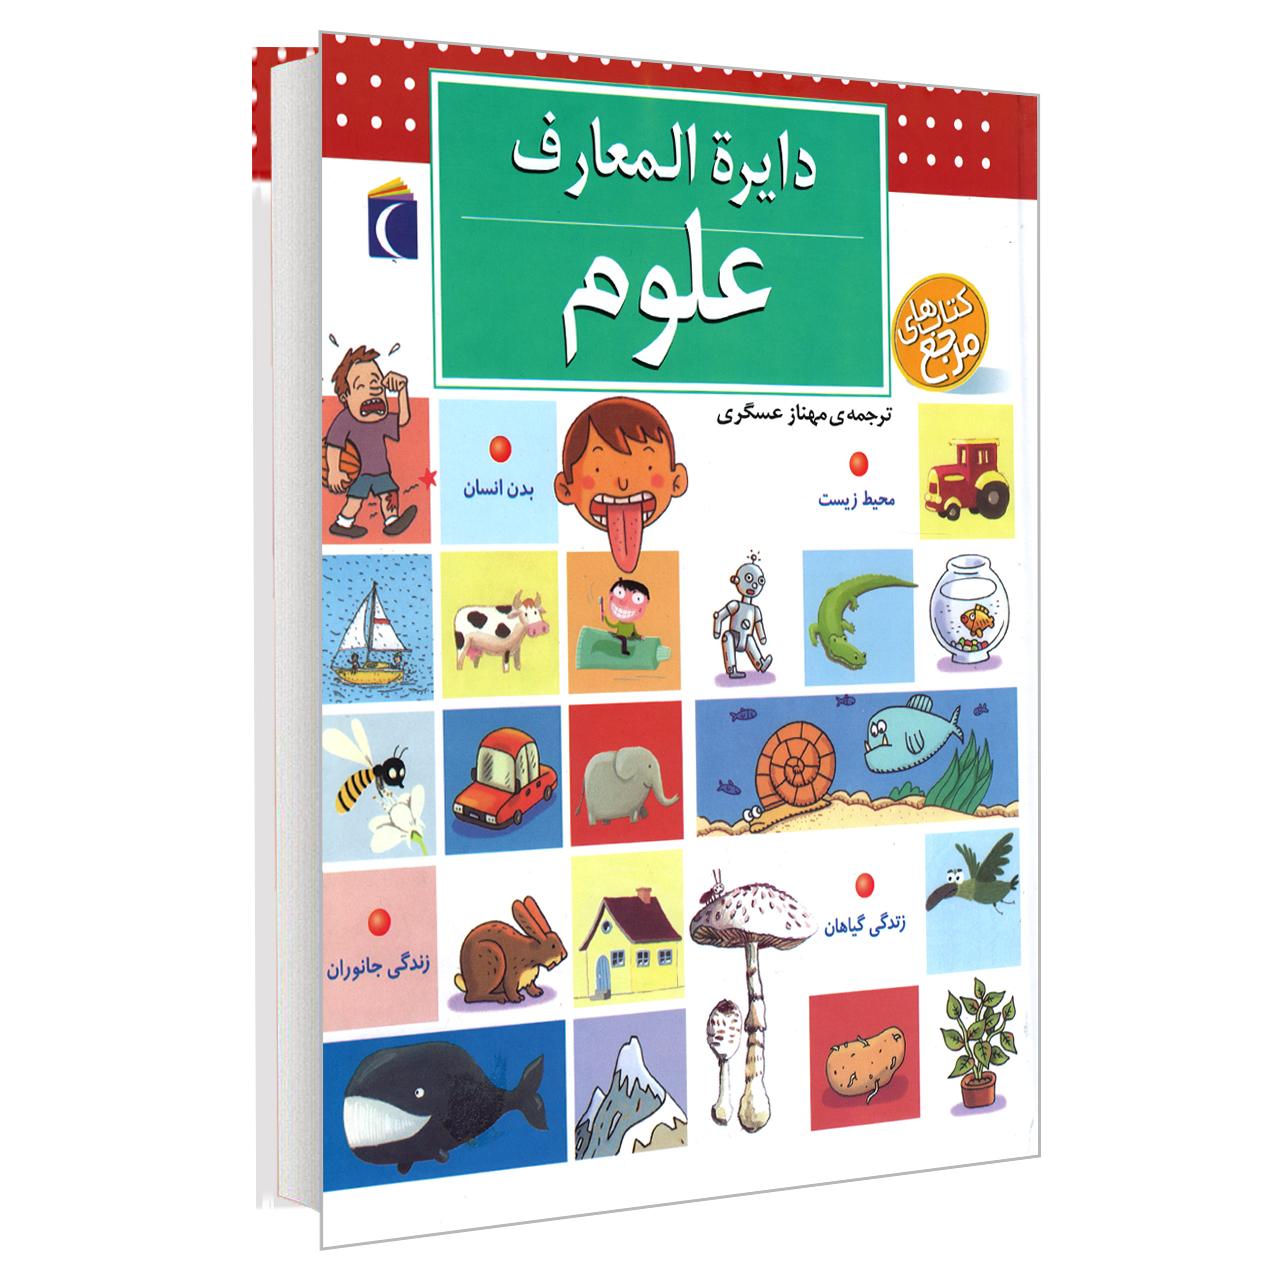 کتاب دایره المعارف علوم اثر پاسکال شوول نشر محراب قلم